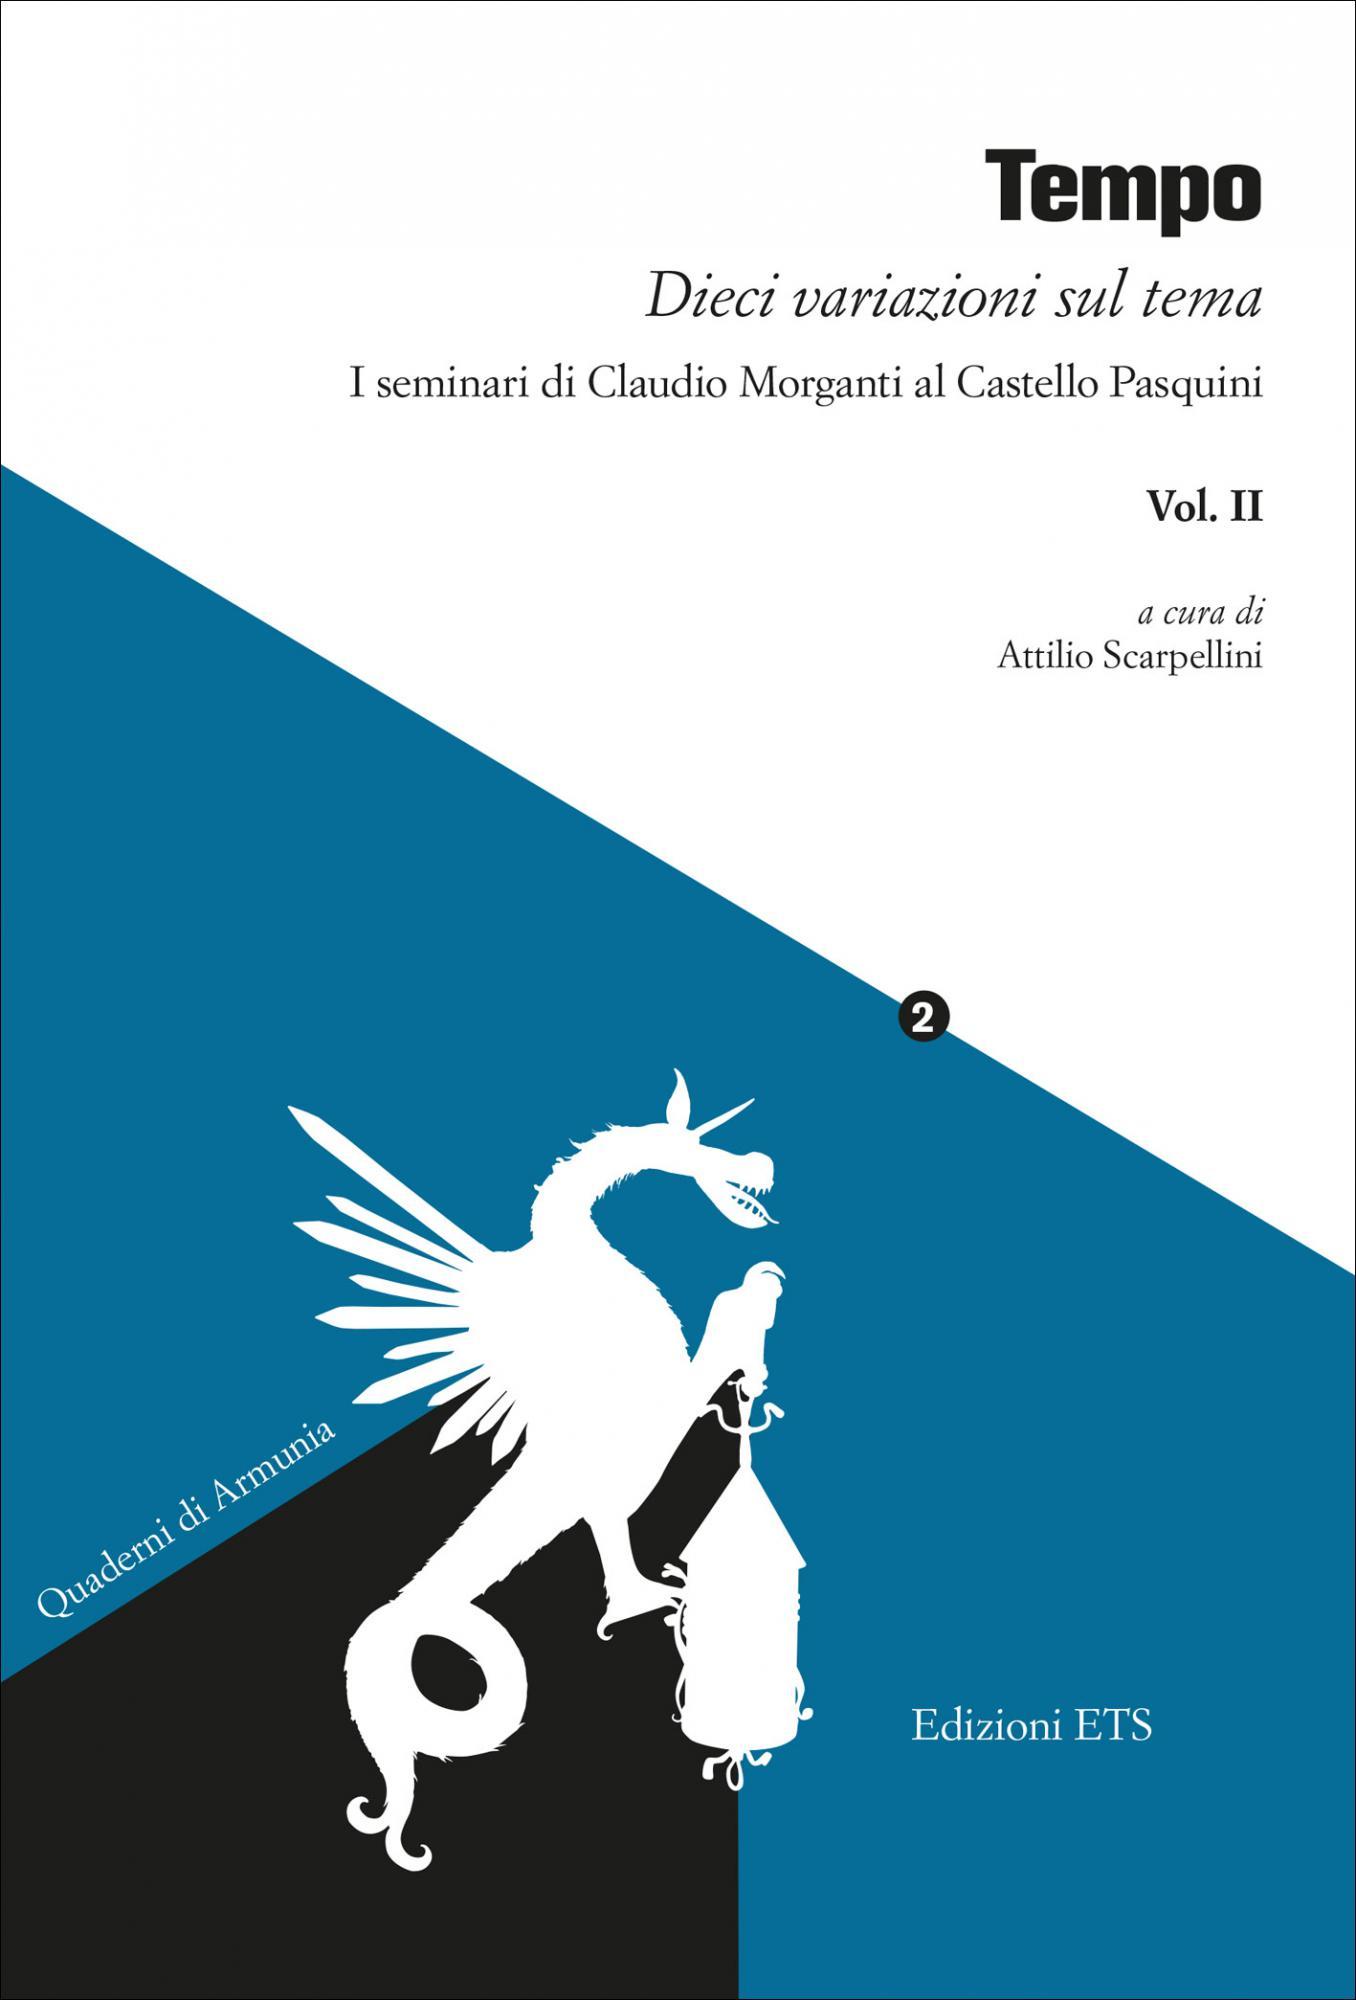 Tempo. <em>Dieci variazioni sul tema</em>.I seminari di Claudio Morganti al Castello Pasquini - Vol. II